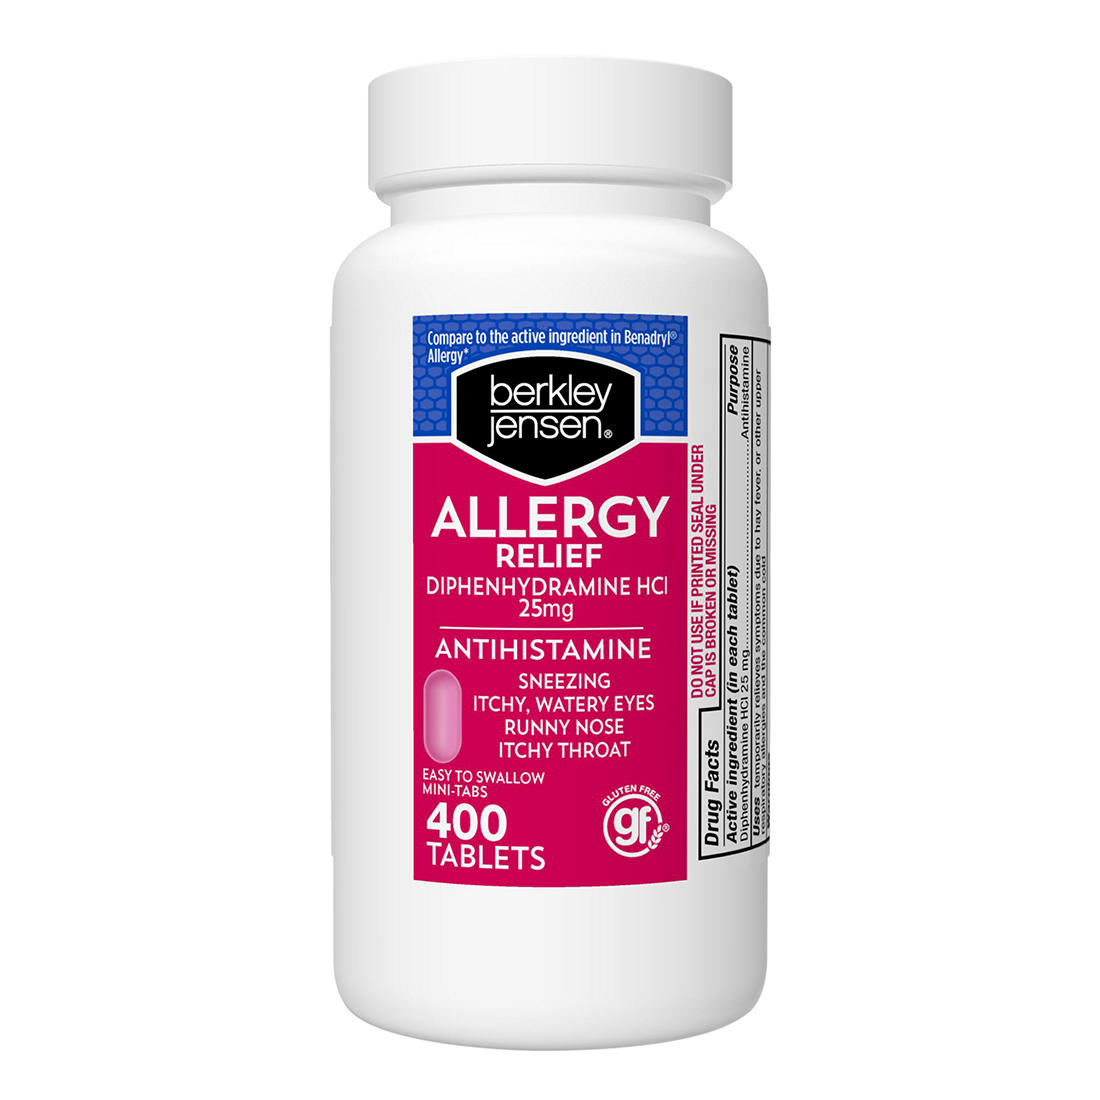 Berkley Jensen 25mg Diphenhydramine Hydrochloride Antihistamine Tablets,  400 ct